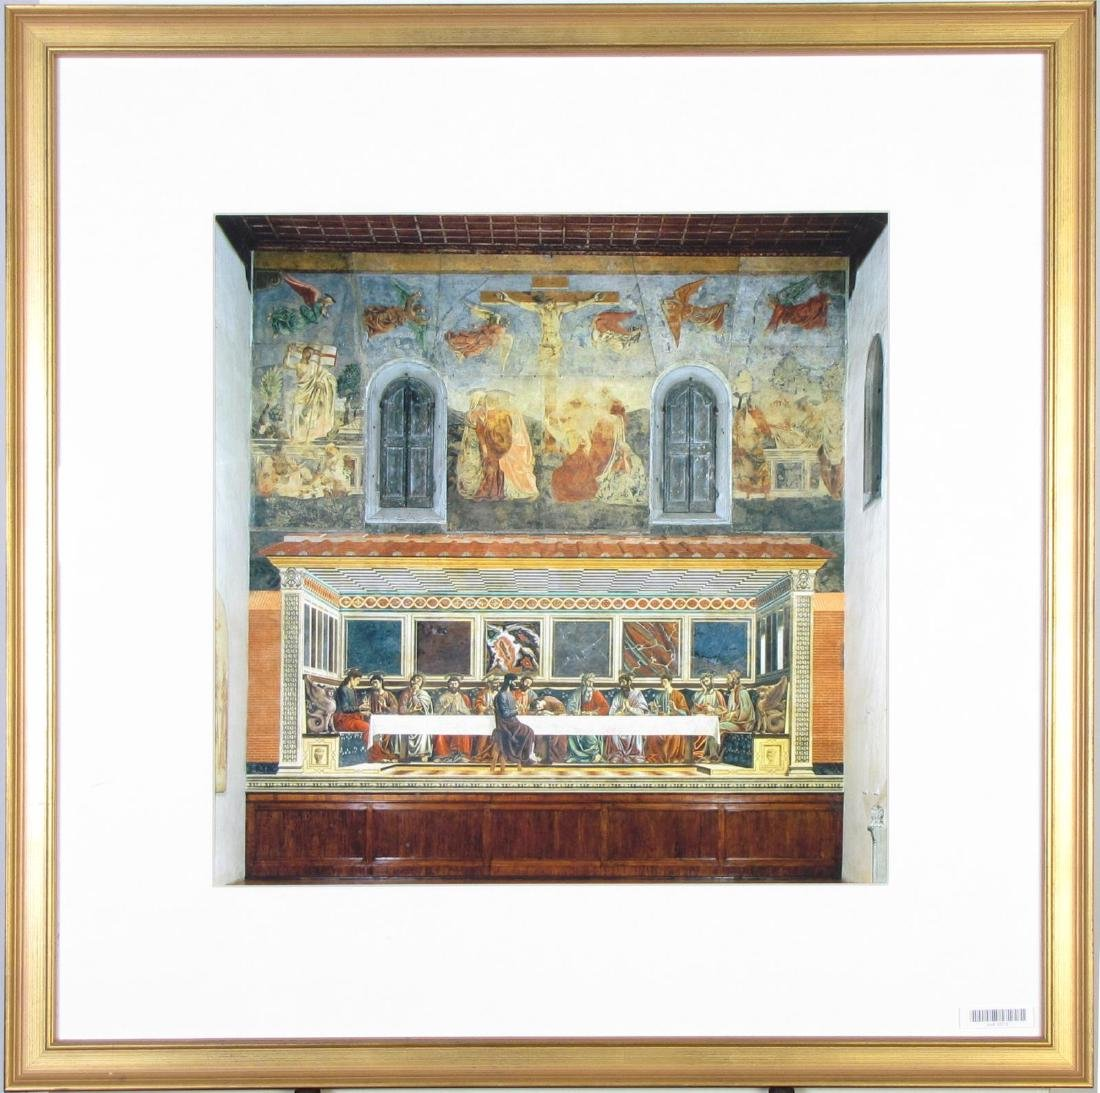 Framed Print of Last Supper